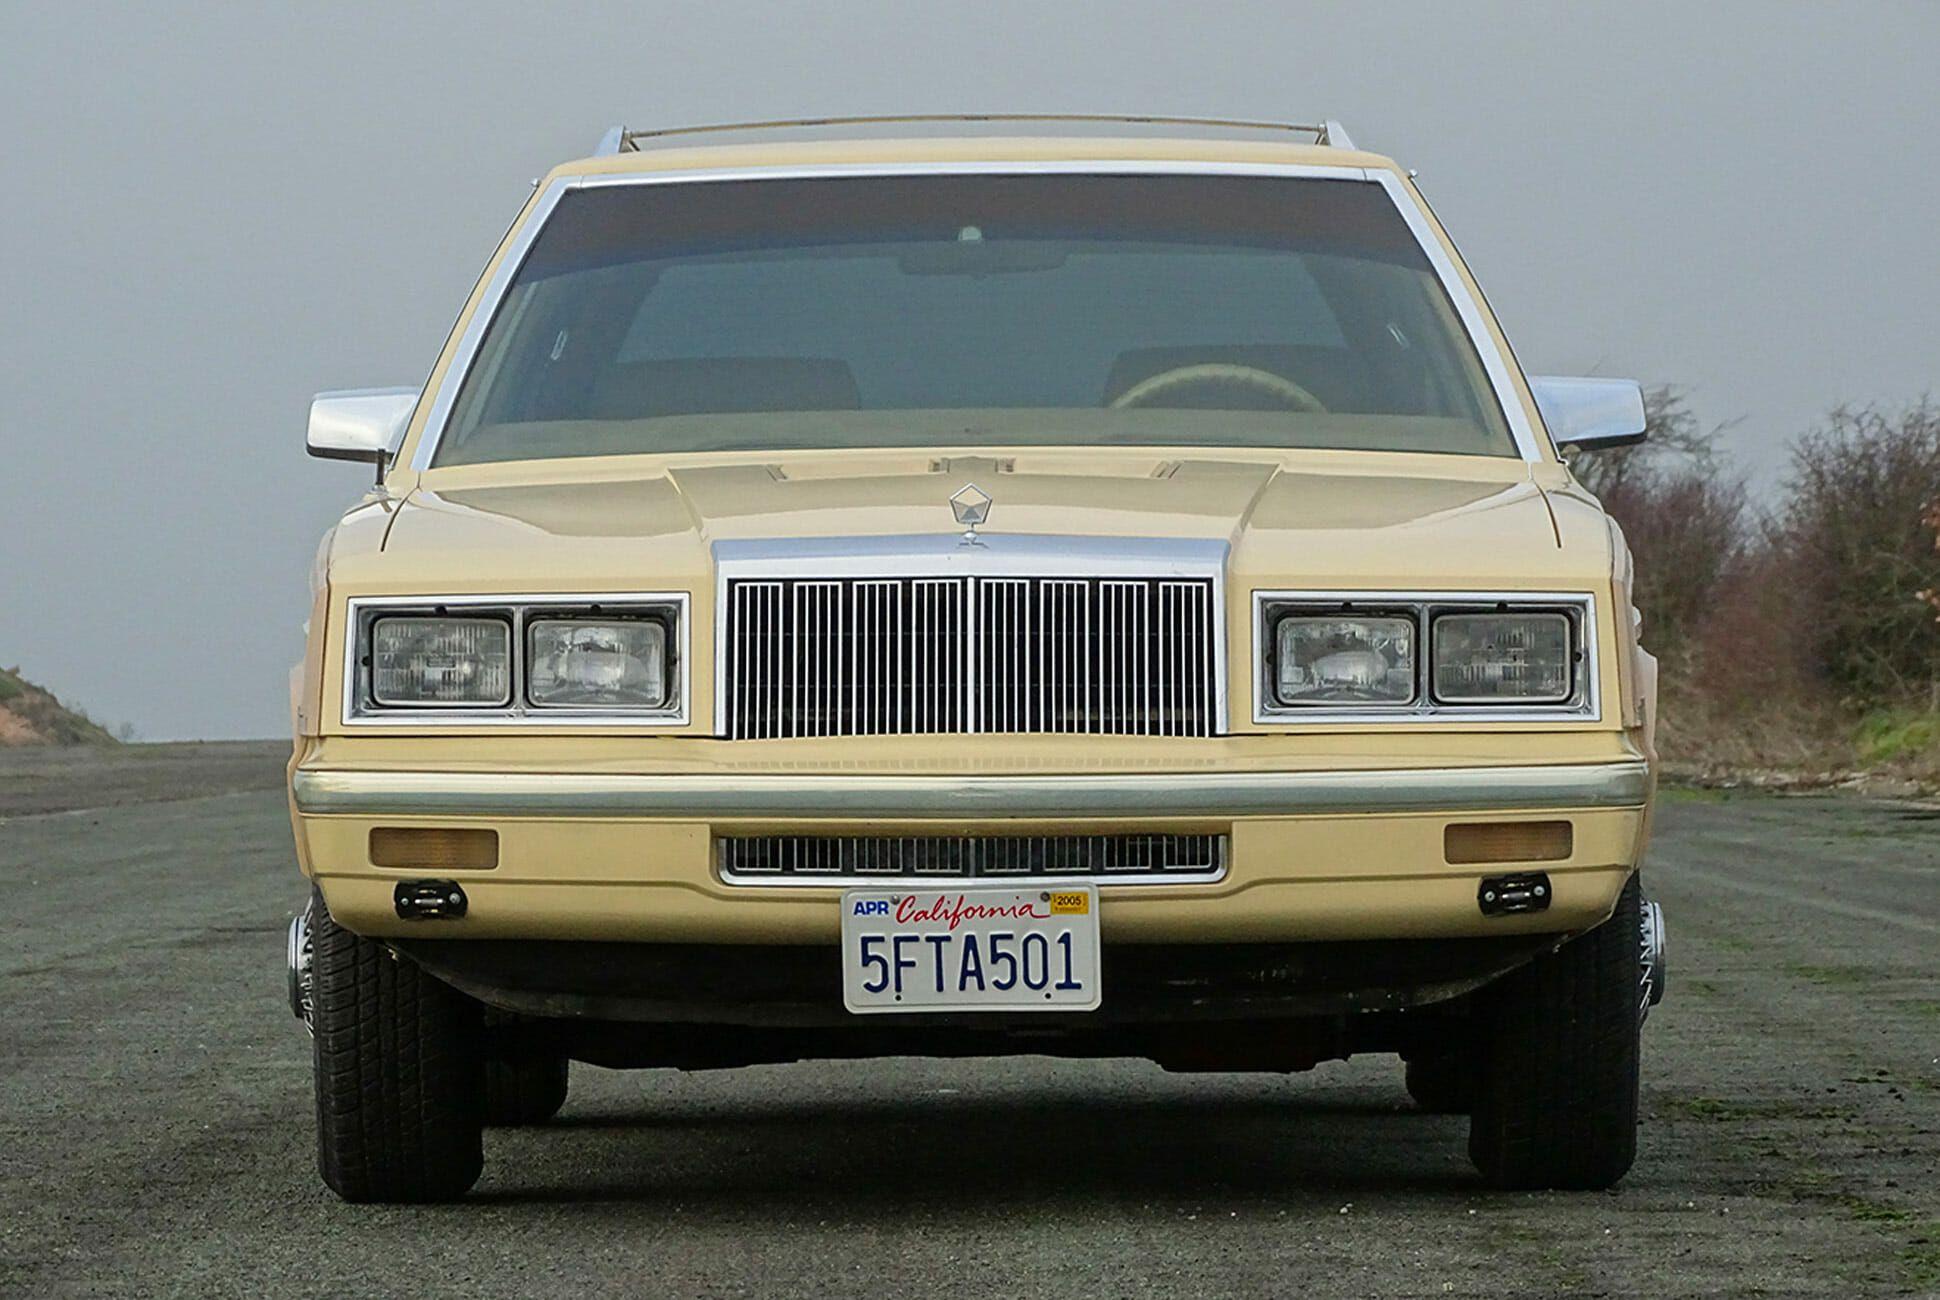 Frank-Sinatra-1985-Chrysler-LeBaron-gear-patrol-slide-4